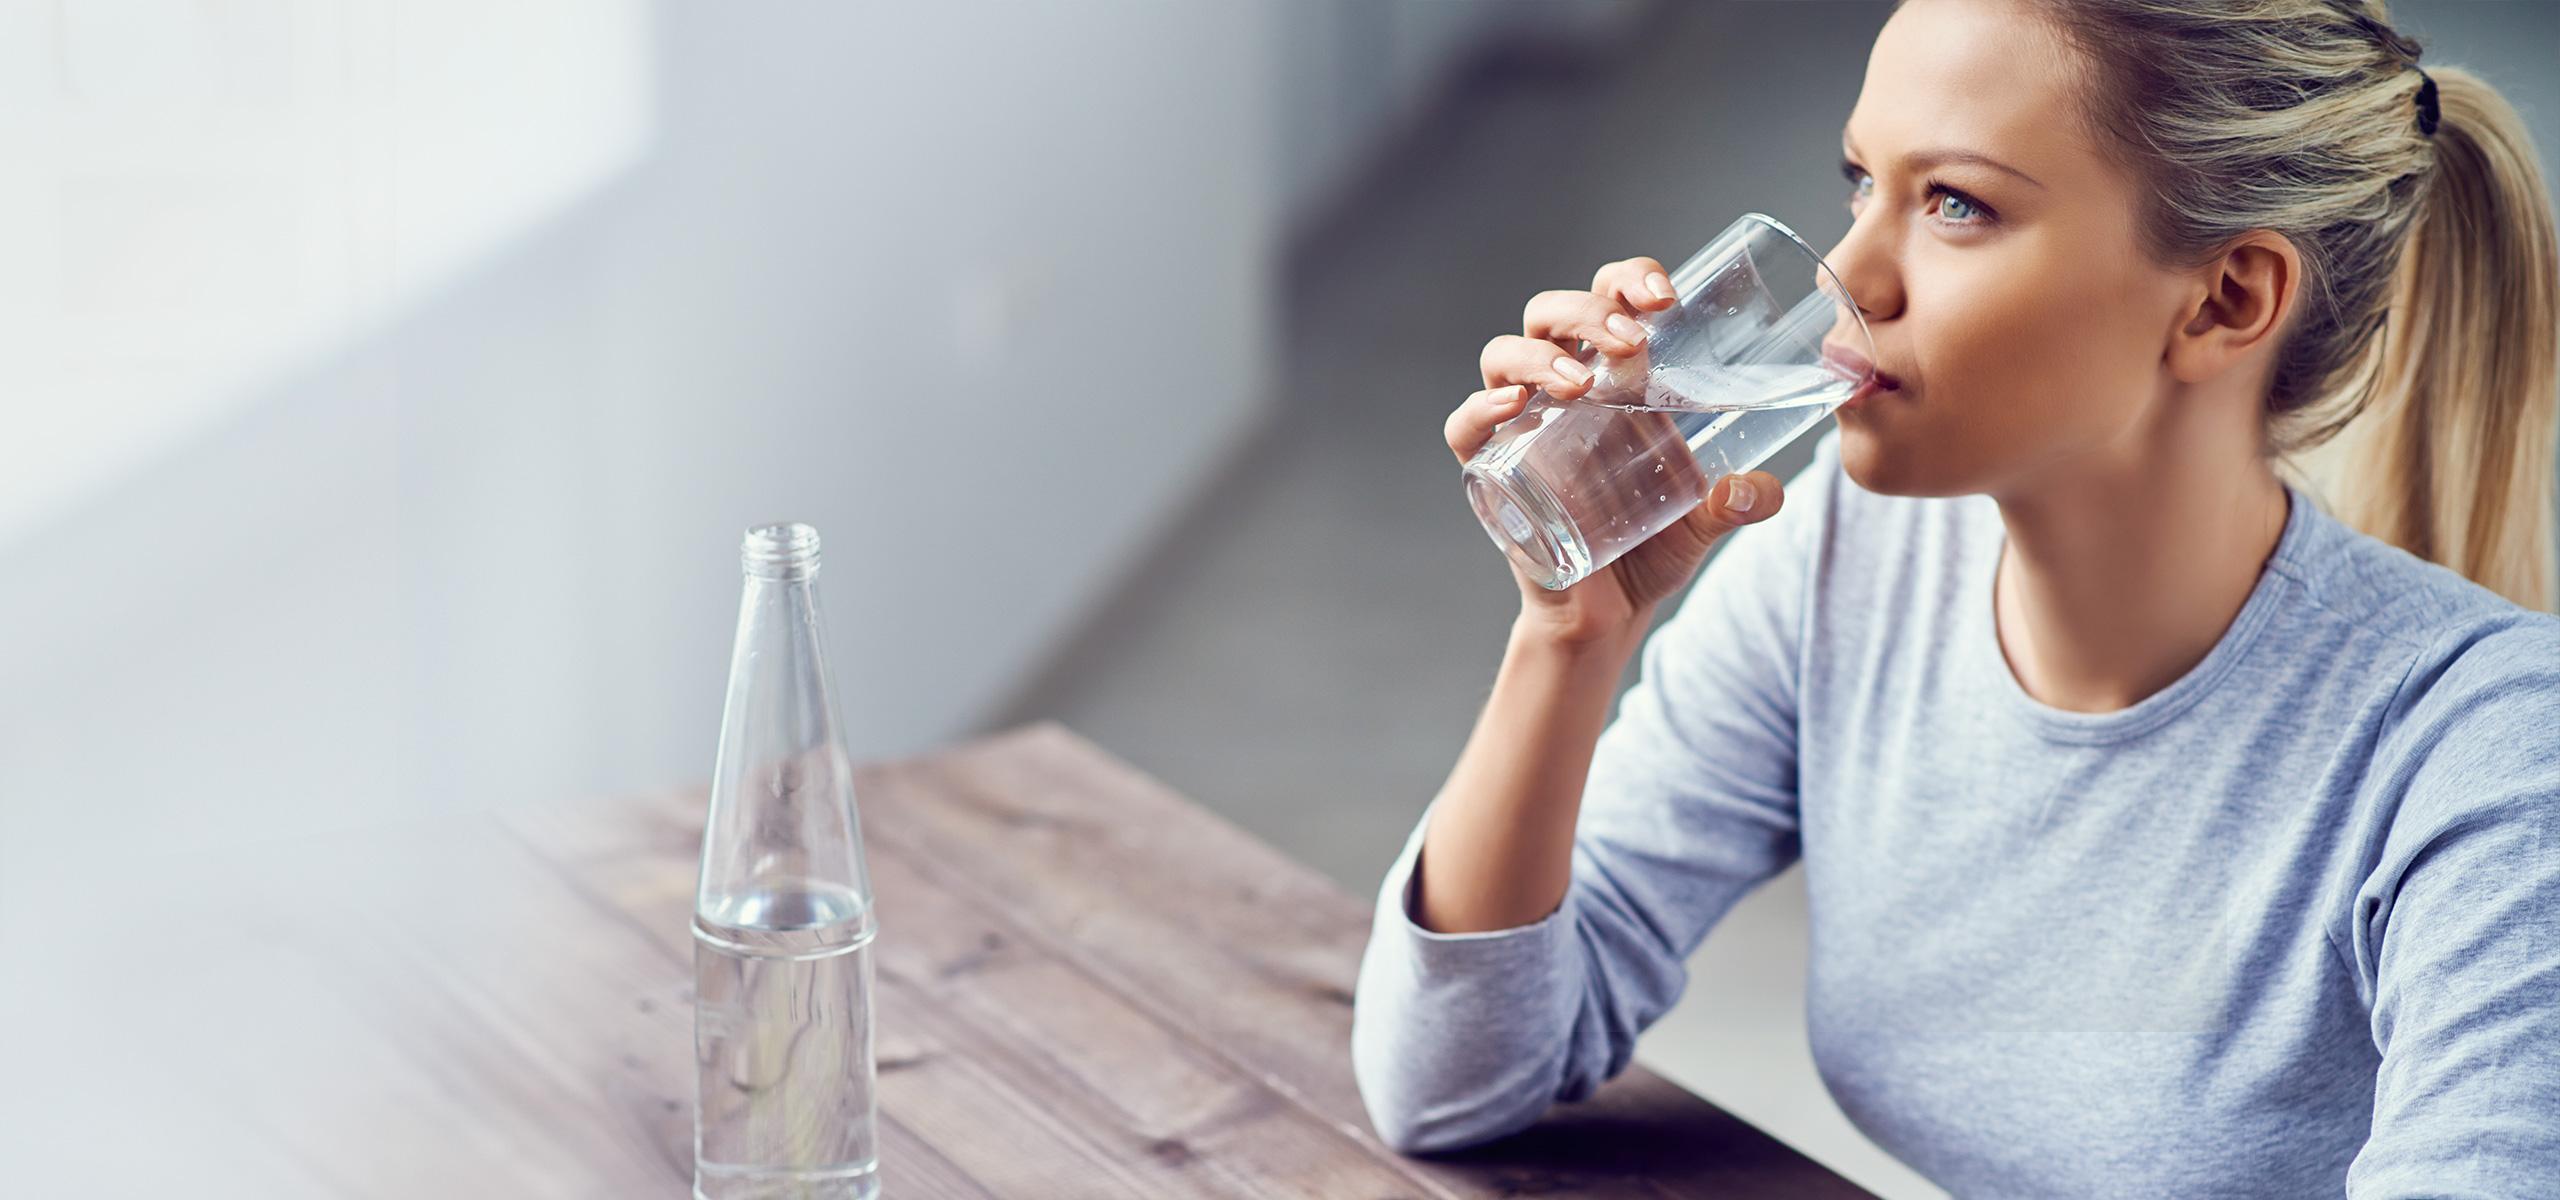 BRITA personal hydration needs woman drinking